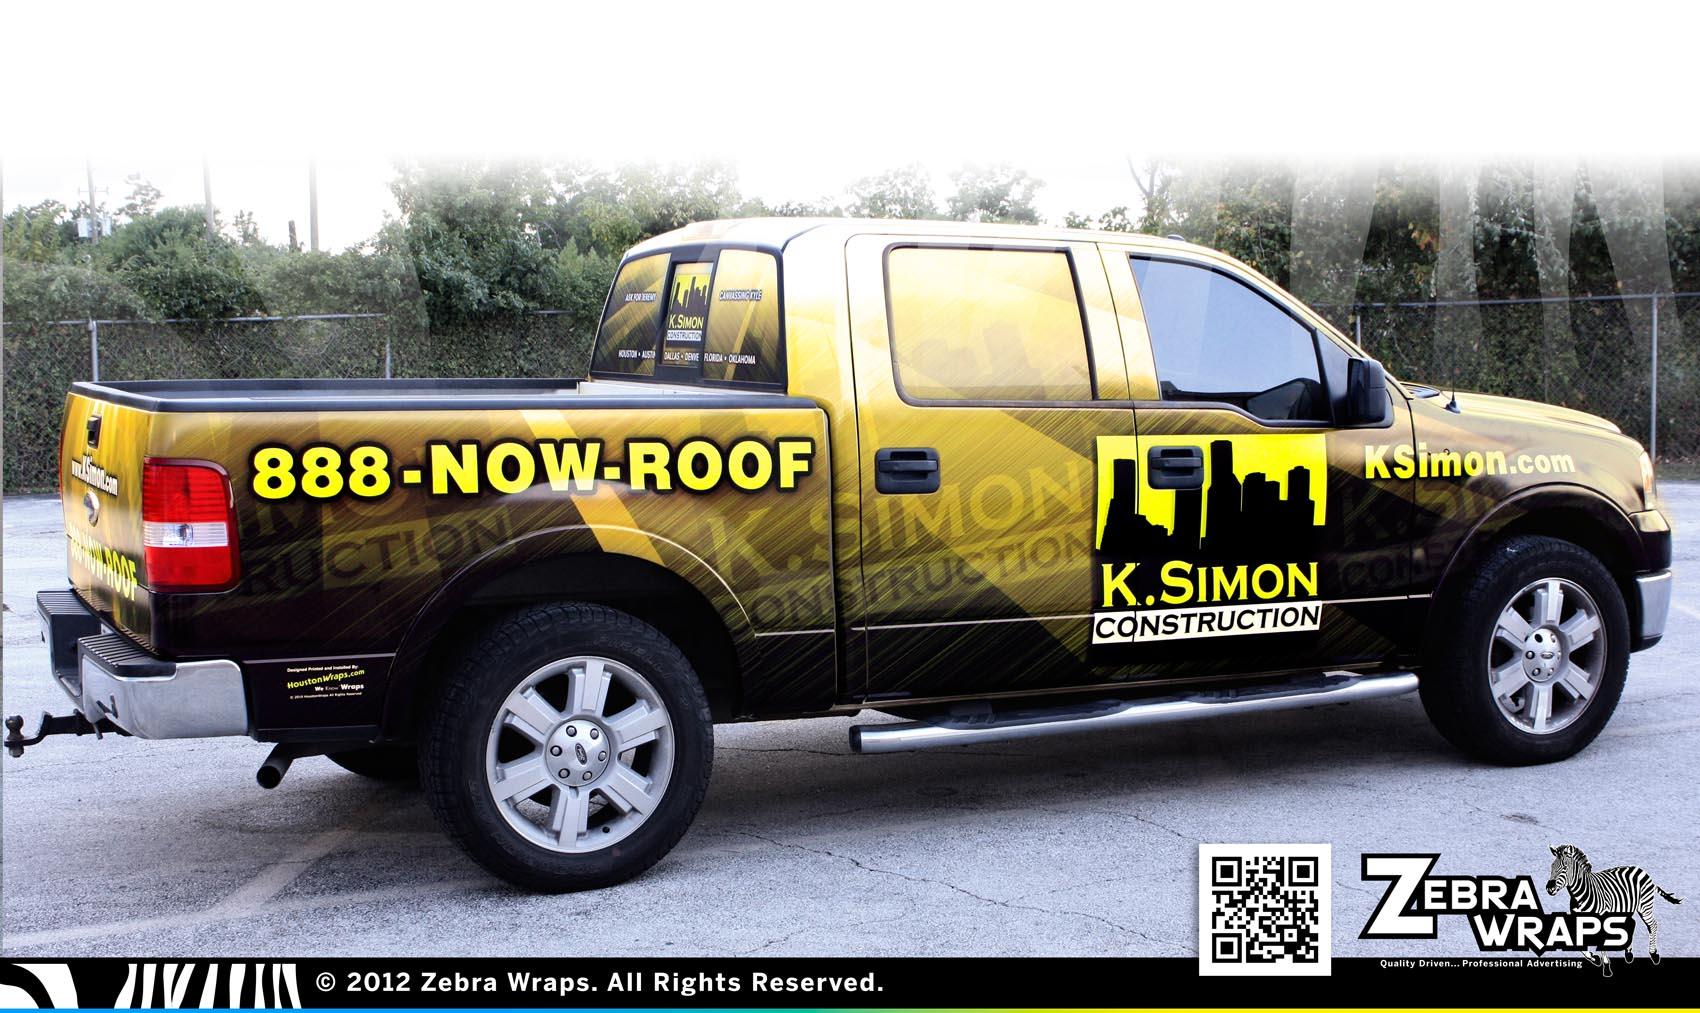 Roofing Vehicle Wrap : K simon jubile construction roofing wrap zebra